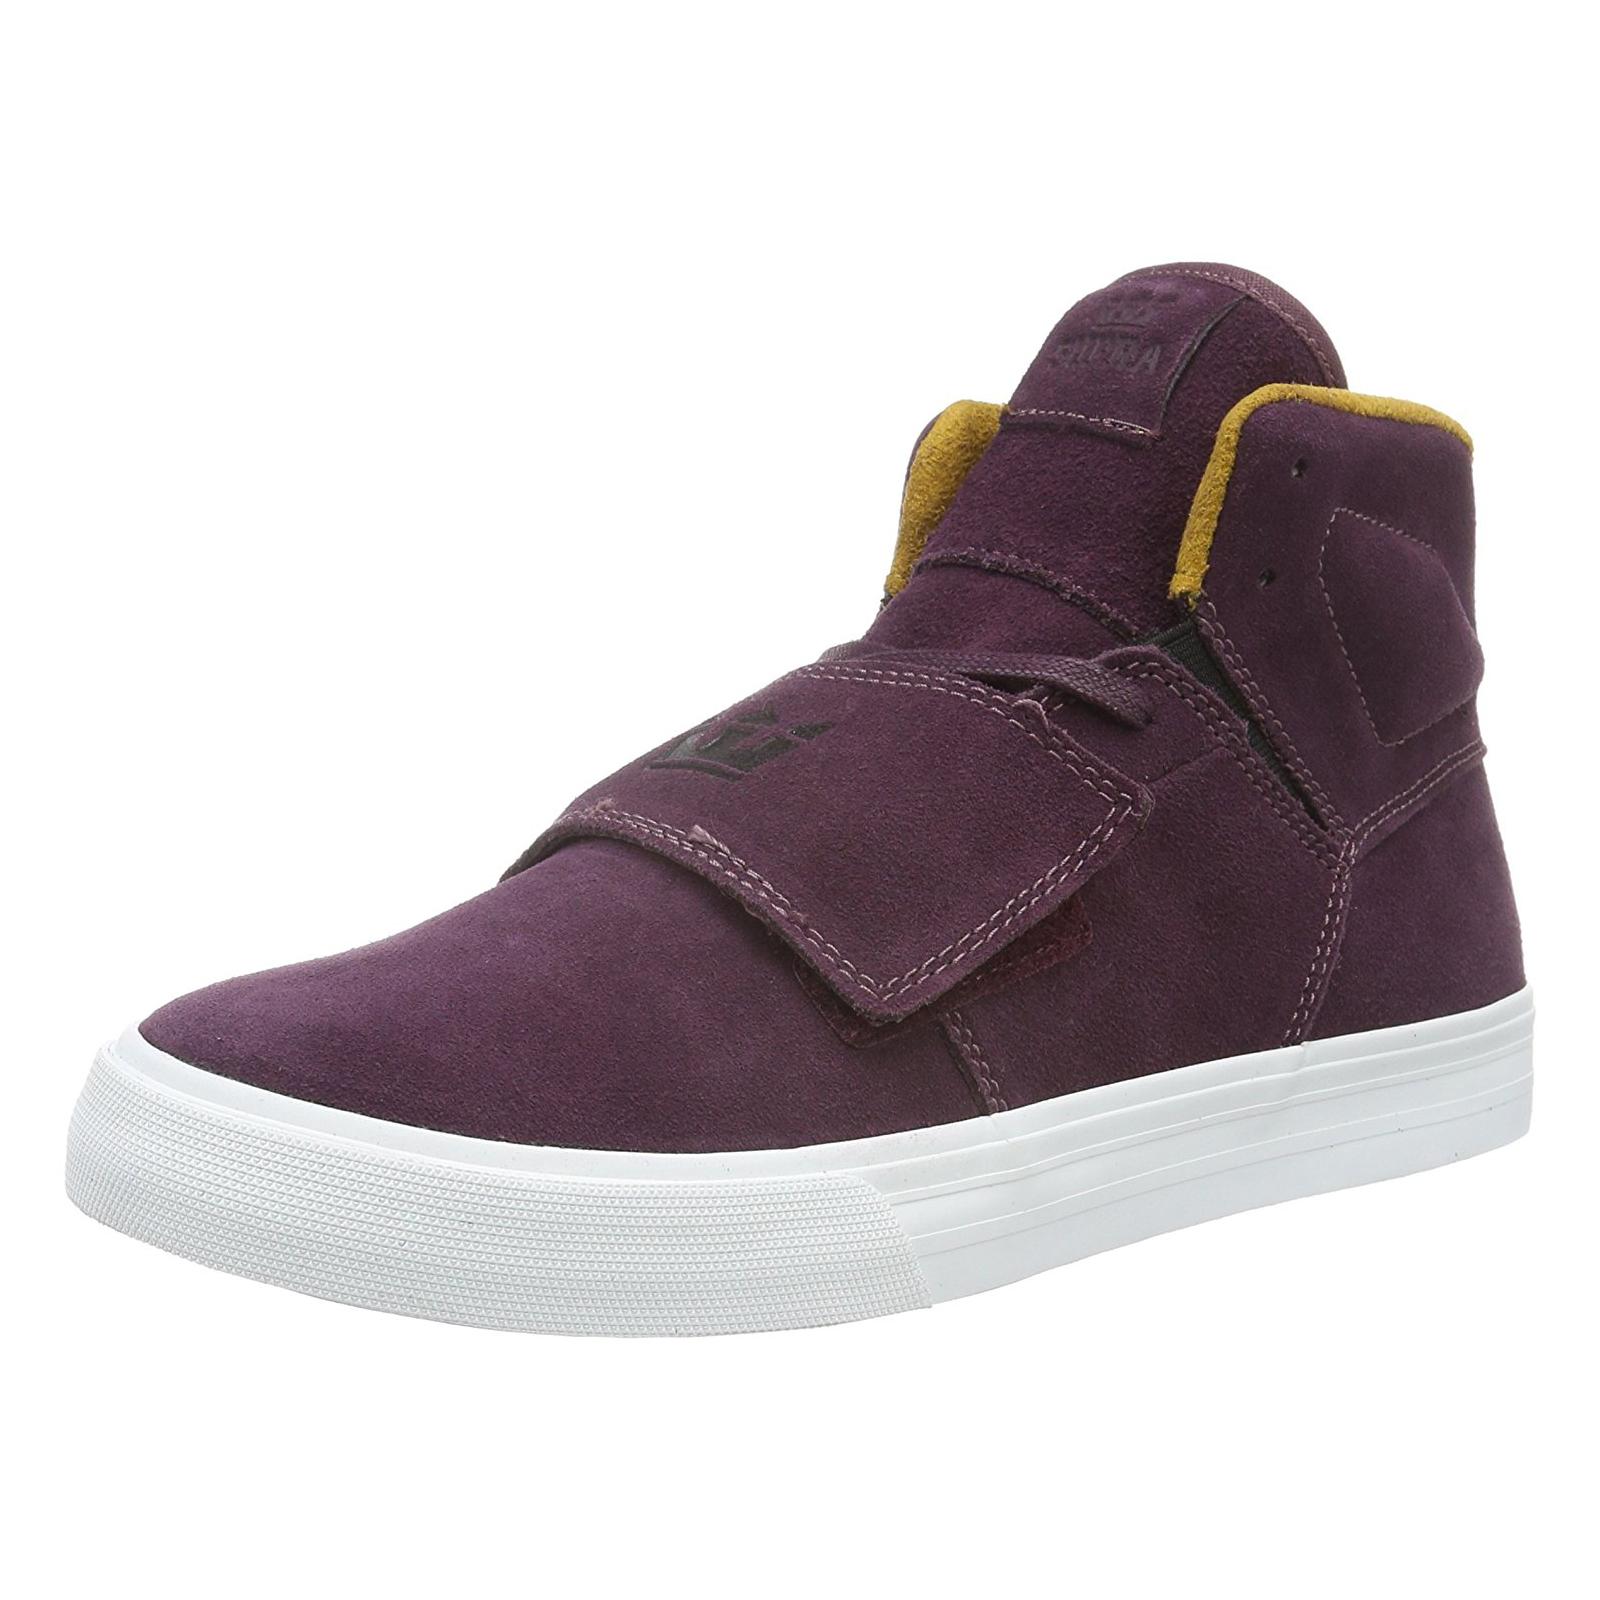 Estate Supra Viola or Rock blanc Burgundy Sneakers wq8f84X0x